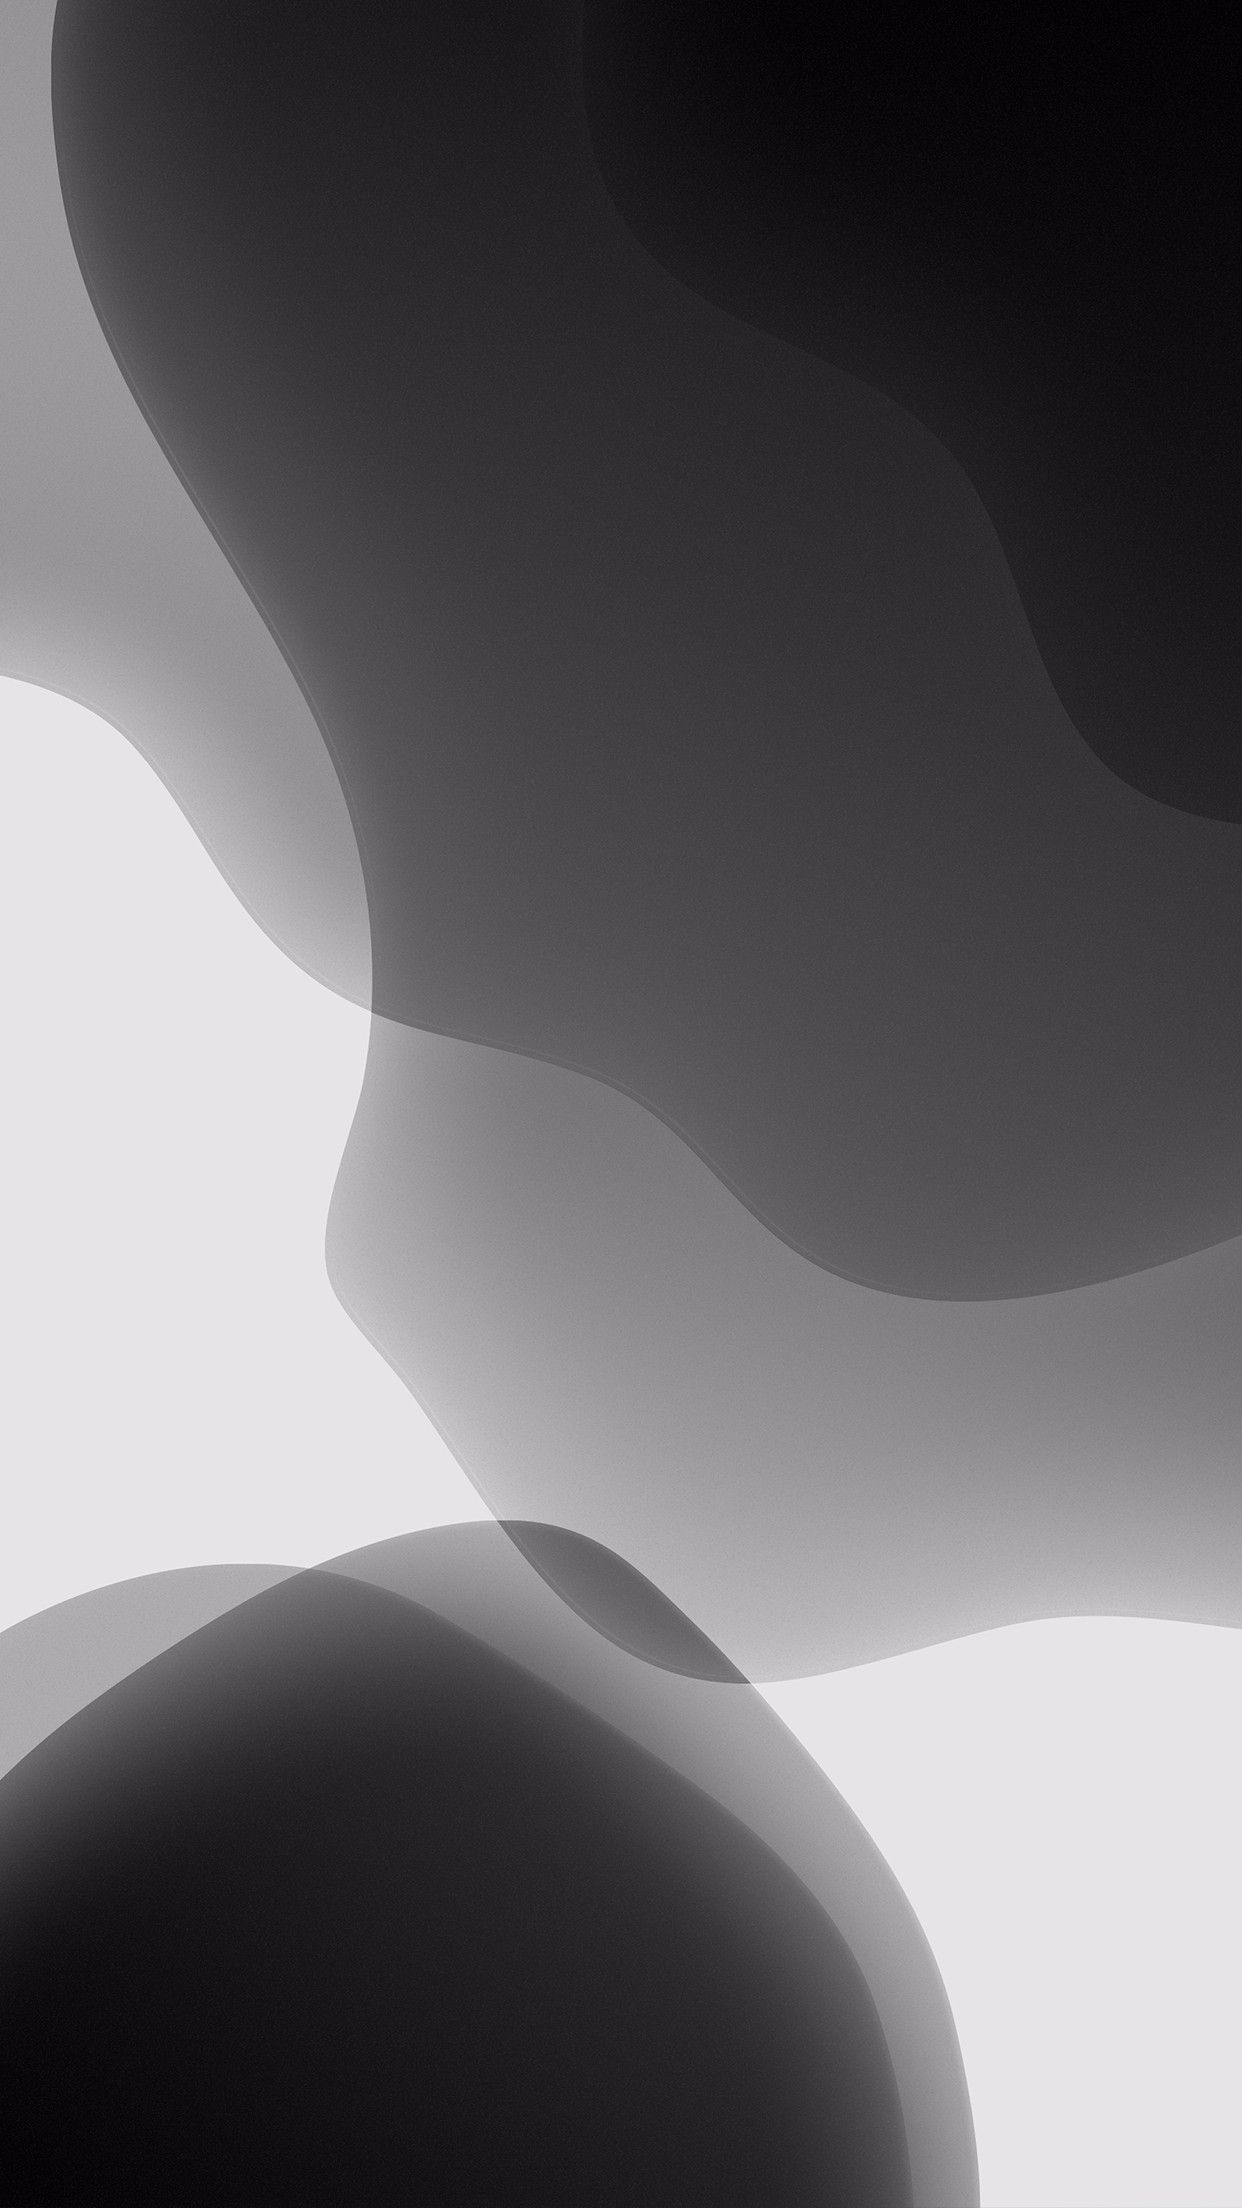 ios 13 Dark wallpaper iphone, Galaxy phone wallpaper